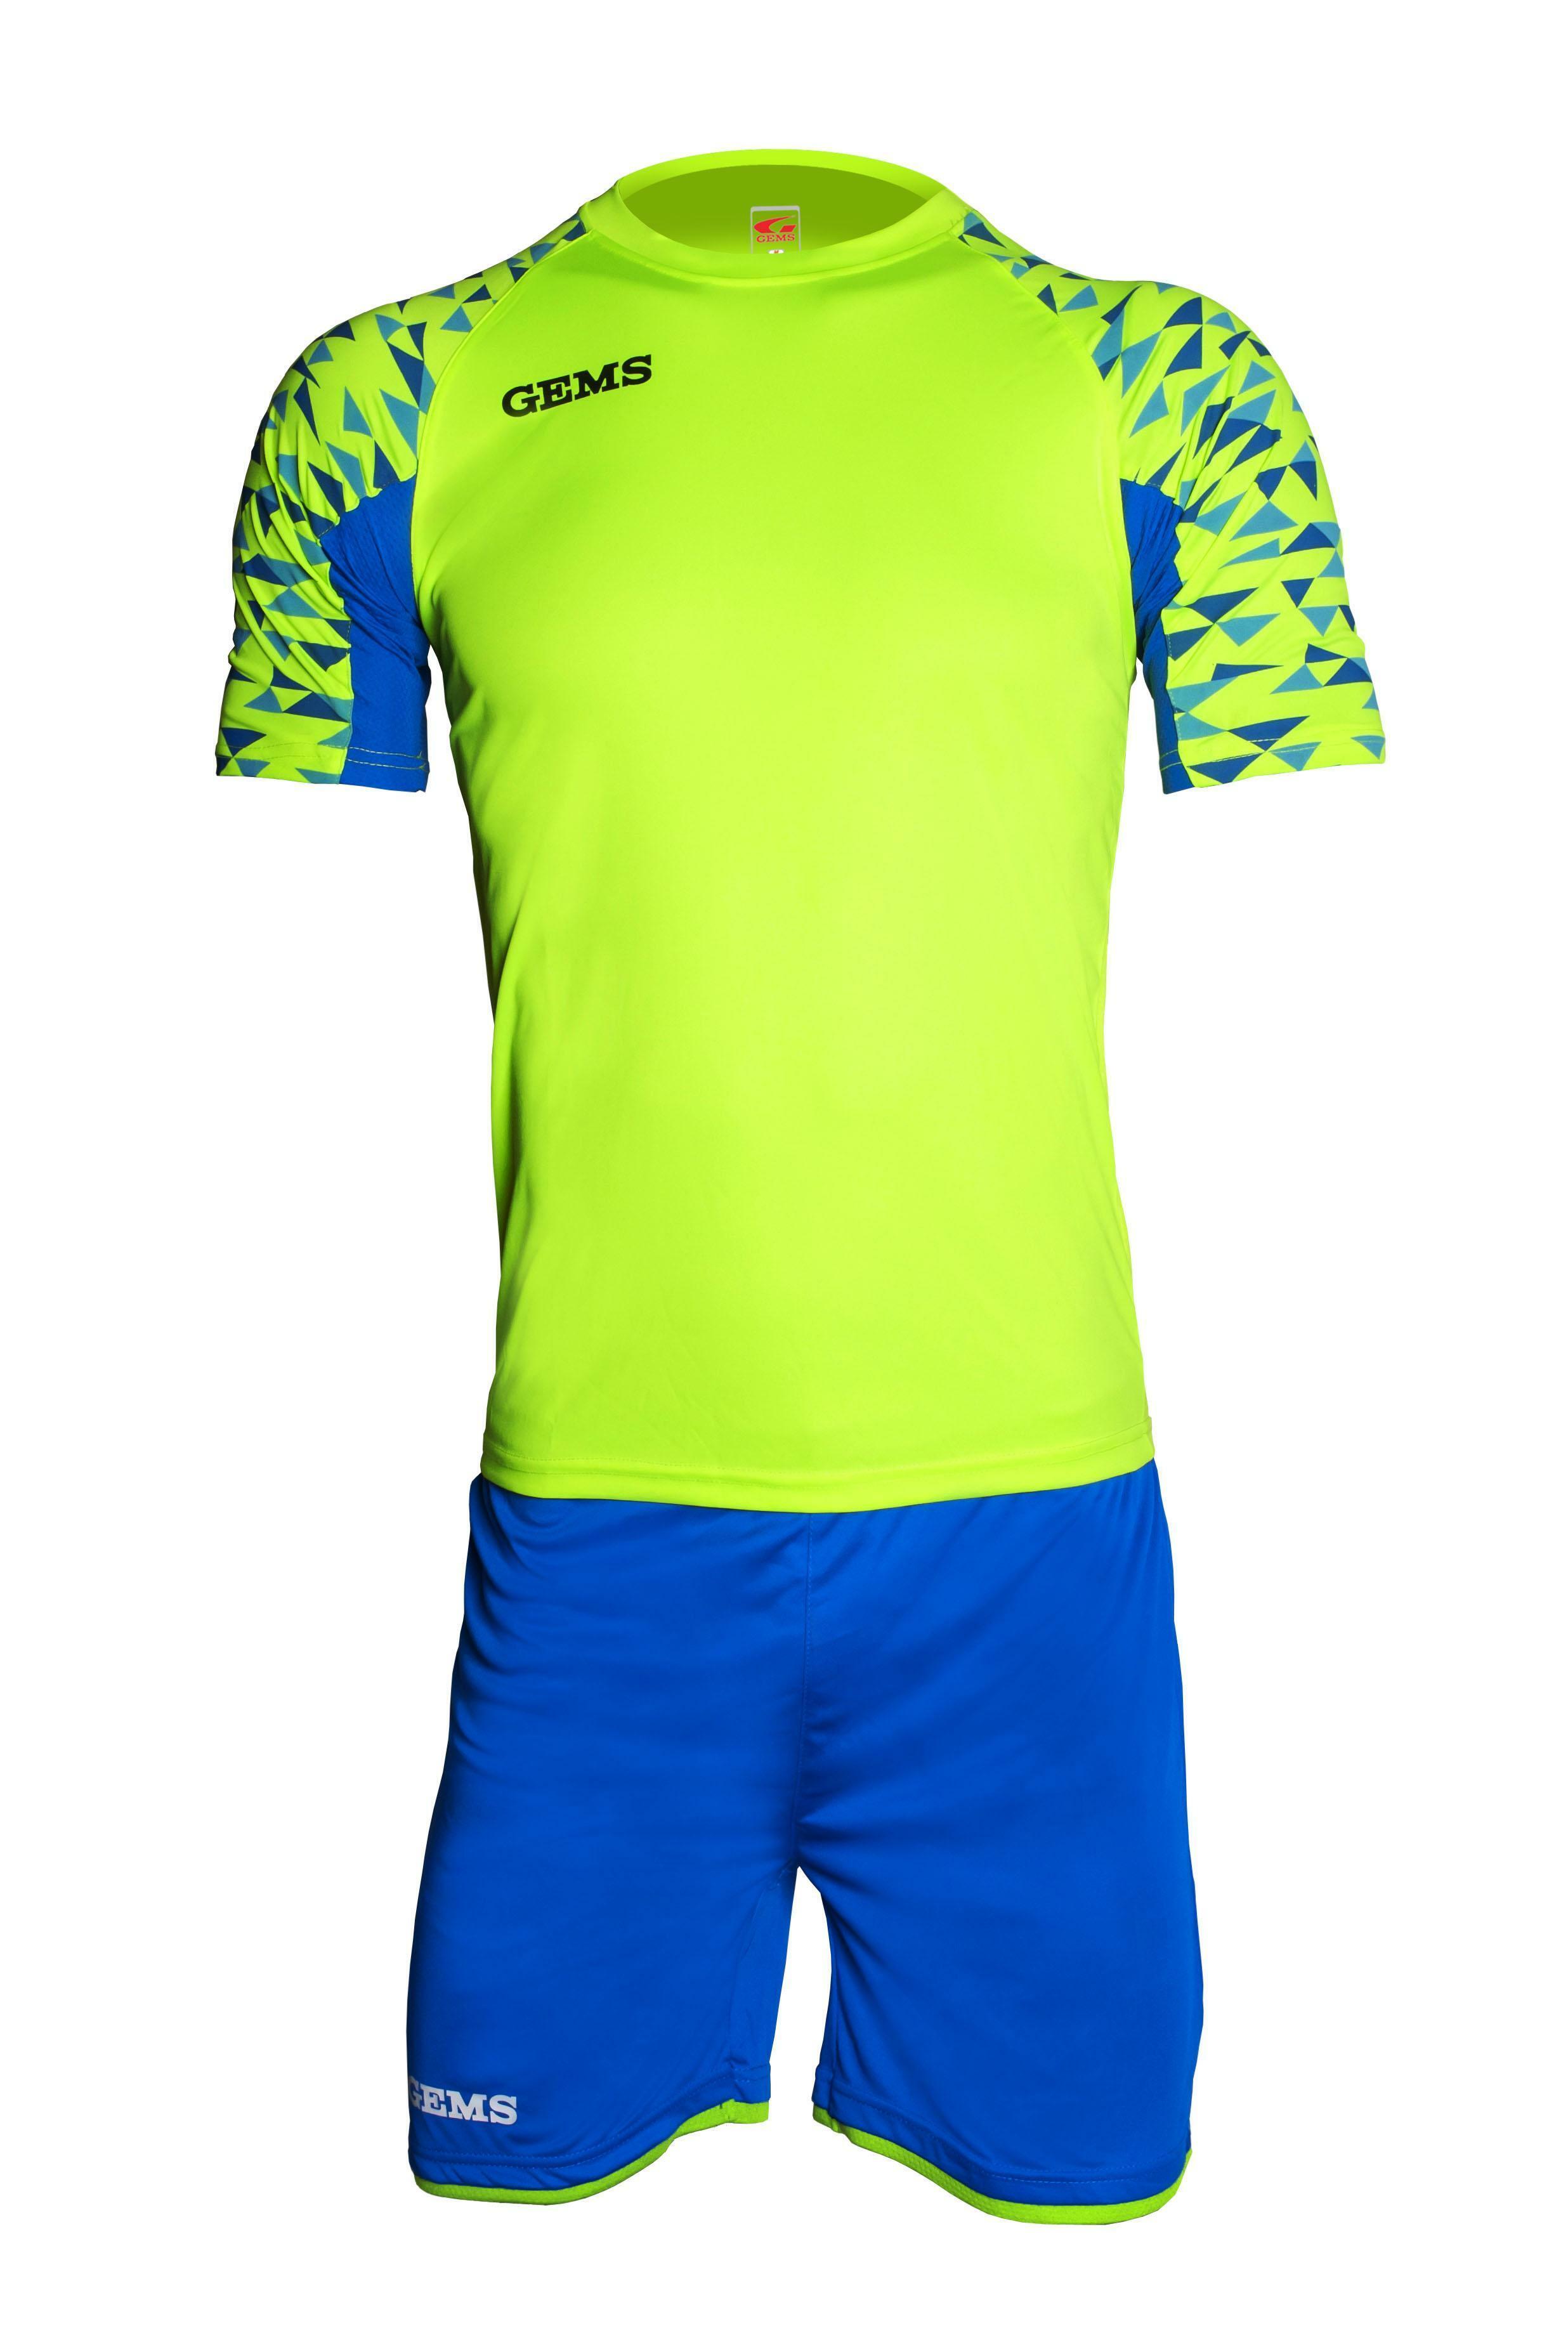 gems gems kit calcio west ham giallo fluo / azzurro